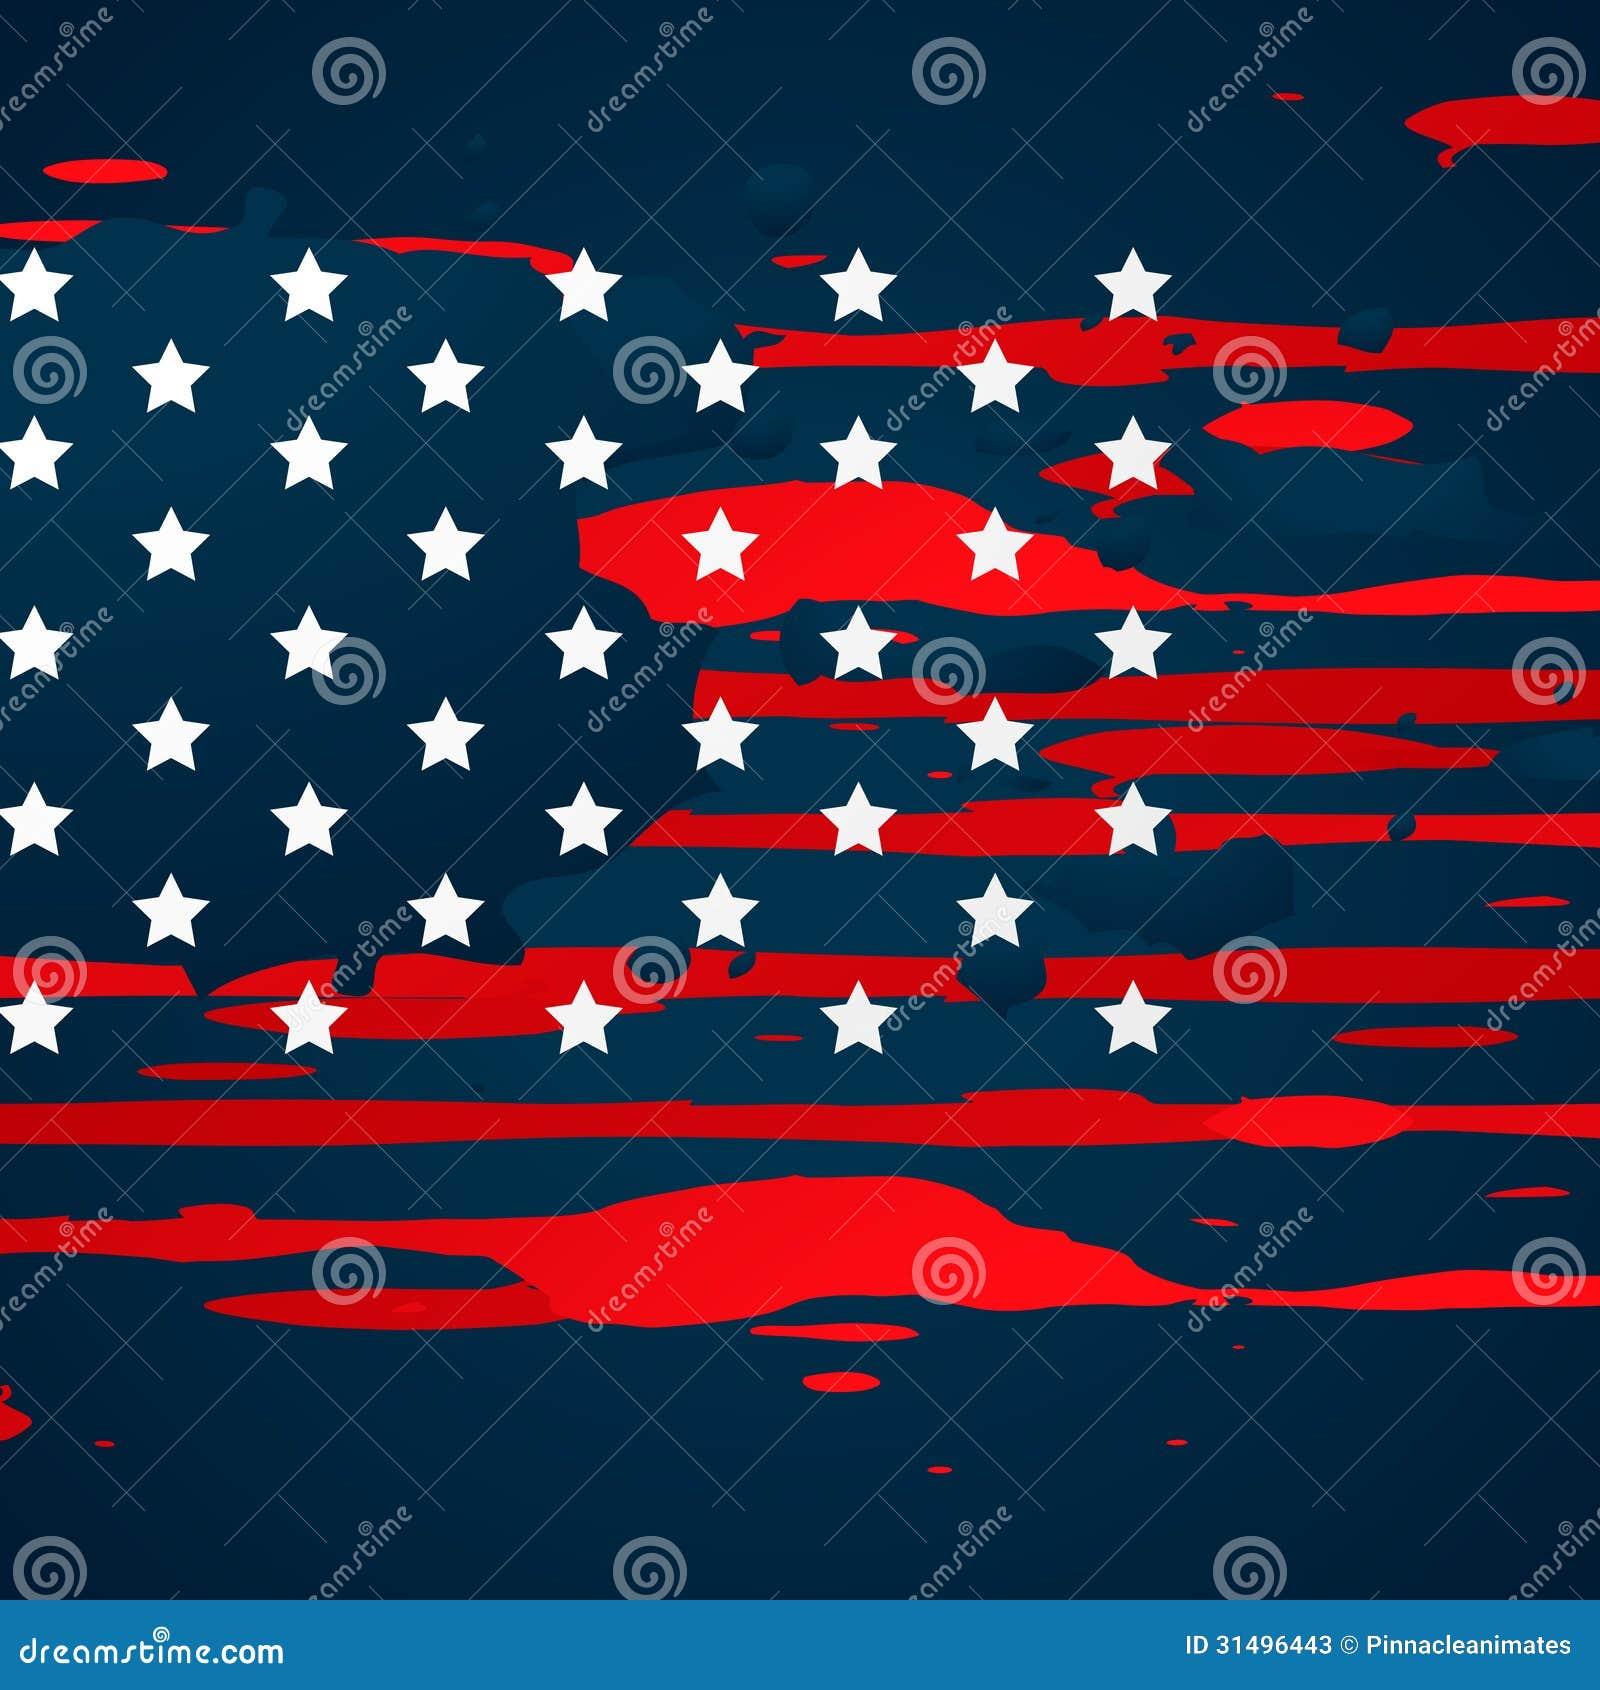 american flag vintage vector - photo #15